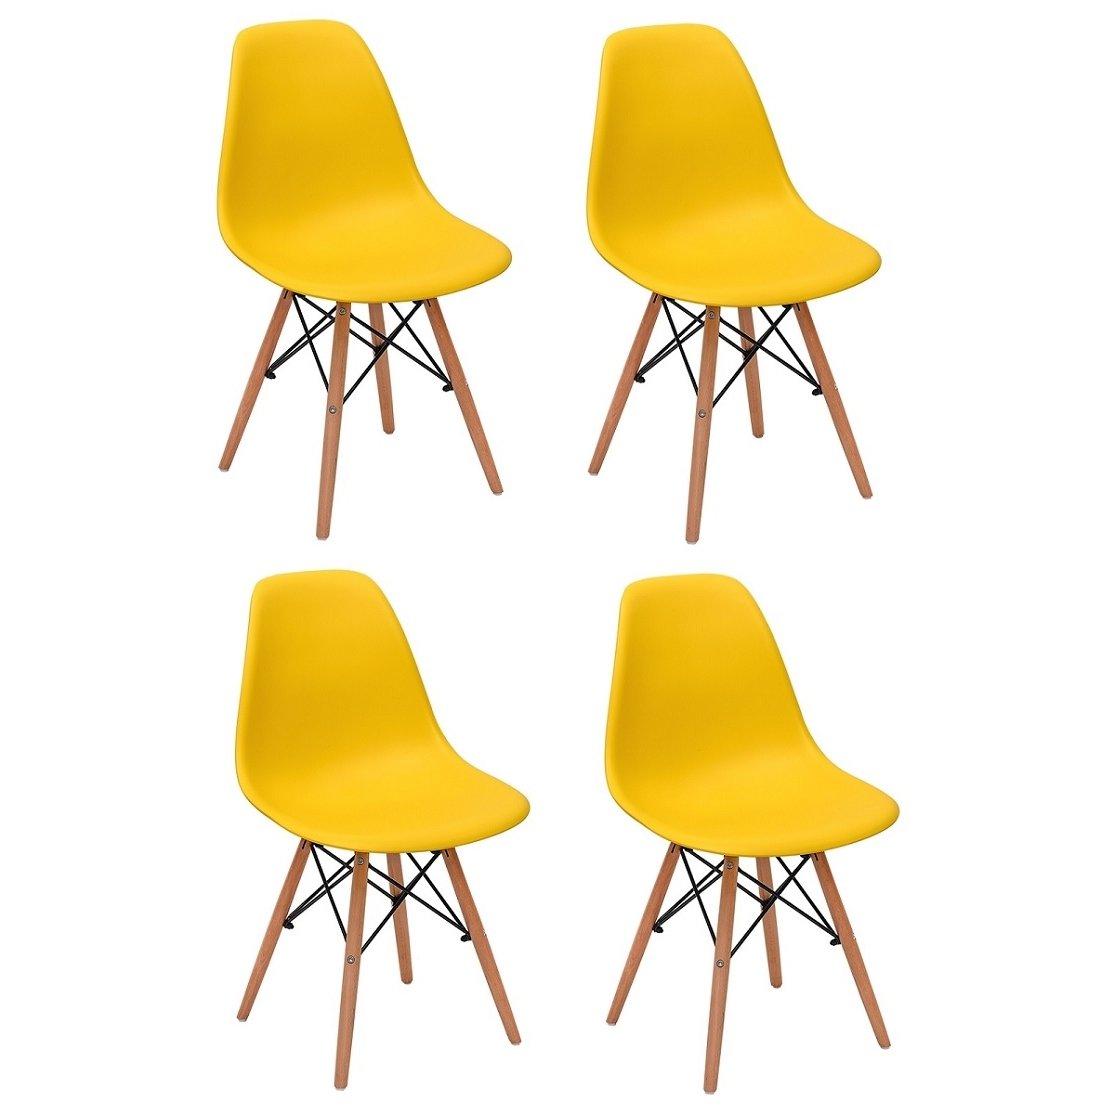 Conjunto 4 Cadeiras Charles Eames Eiffel Wood Base Madeira - Compre Agora  9330417f3d7